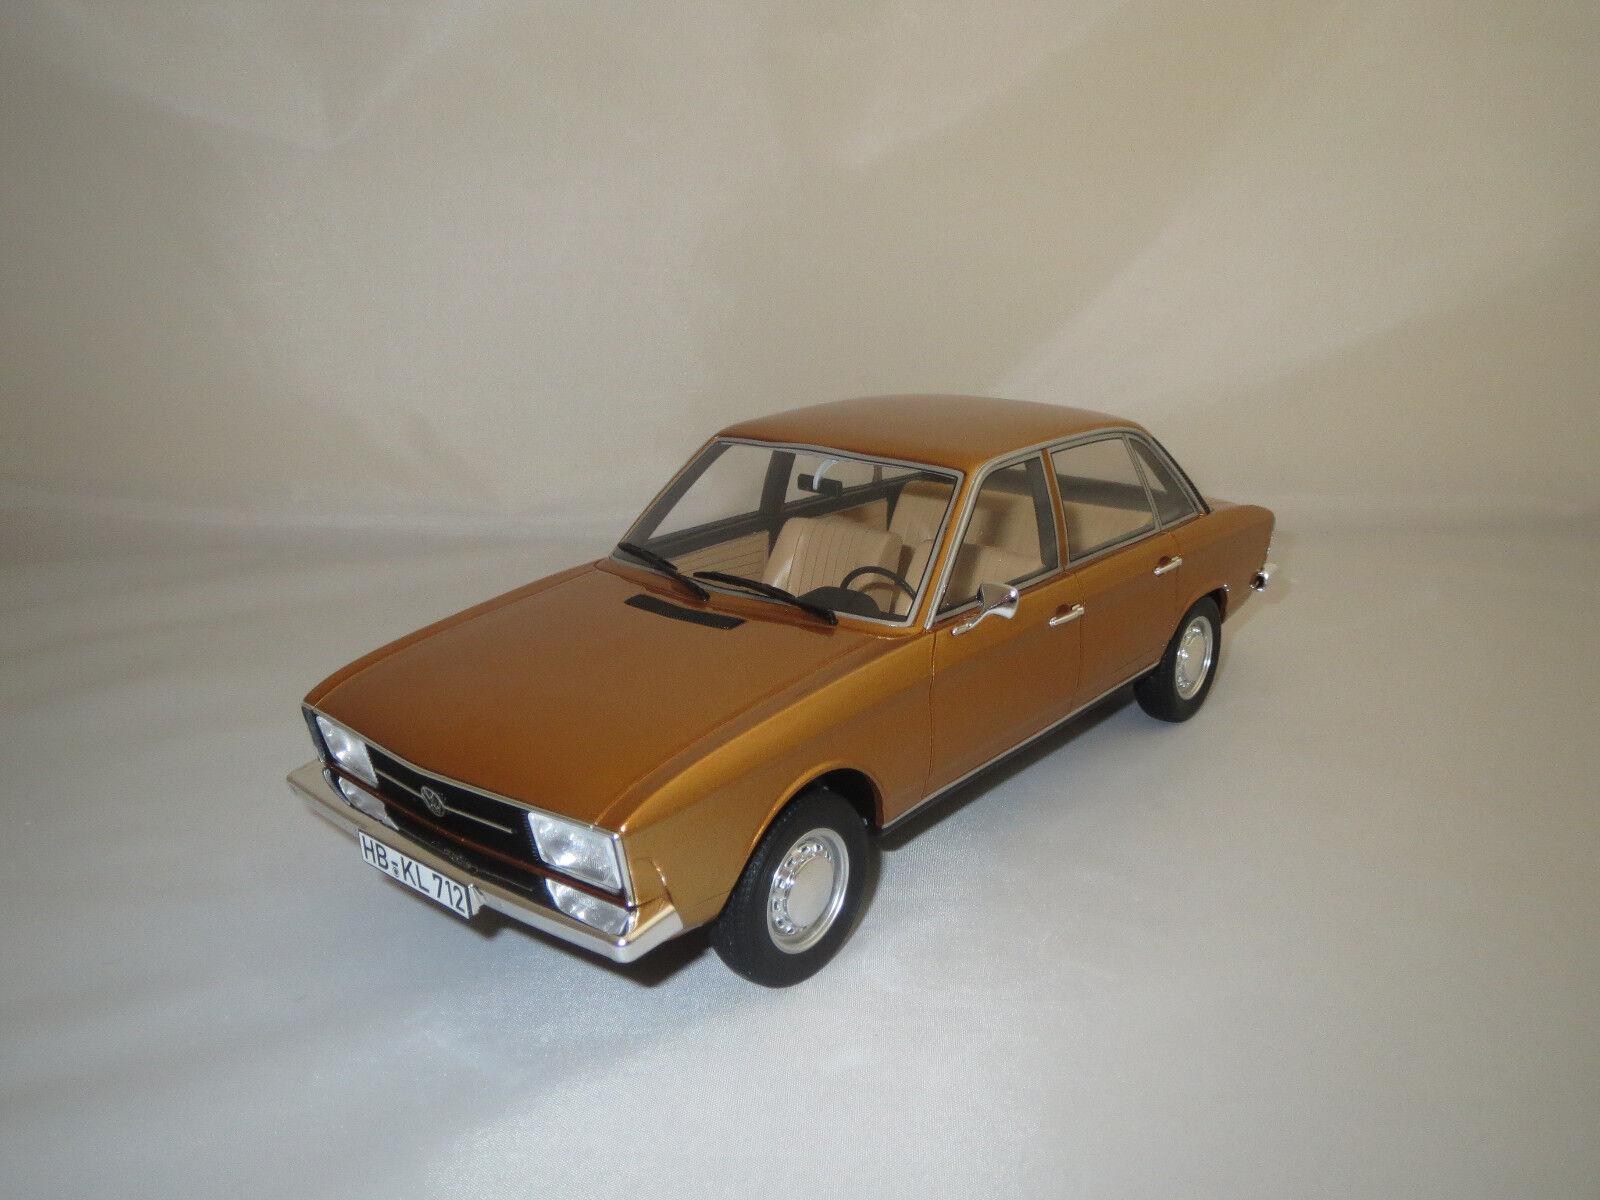 BOS Volkswagen k70  1970  (dunkelor-Metallic) 1 18 neuf dans sa boîte    (A)